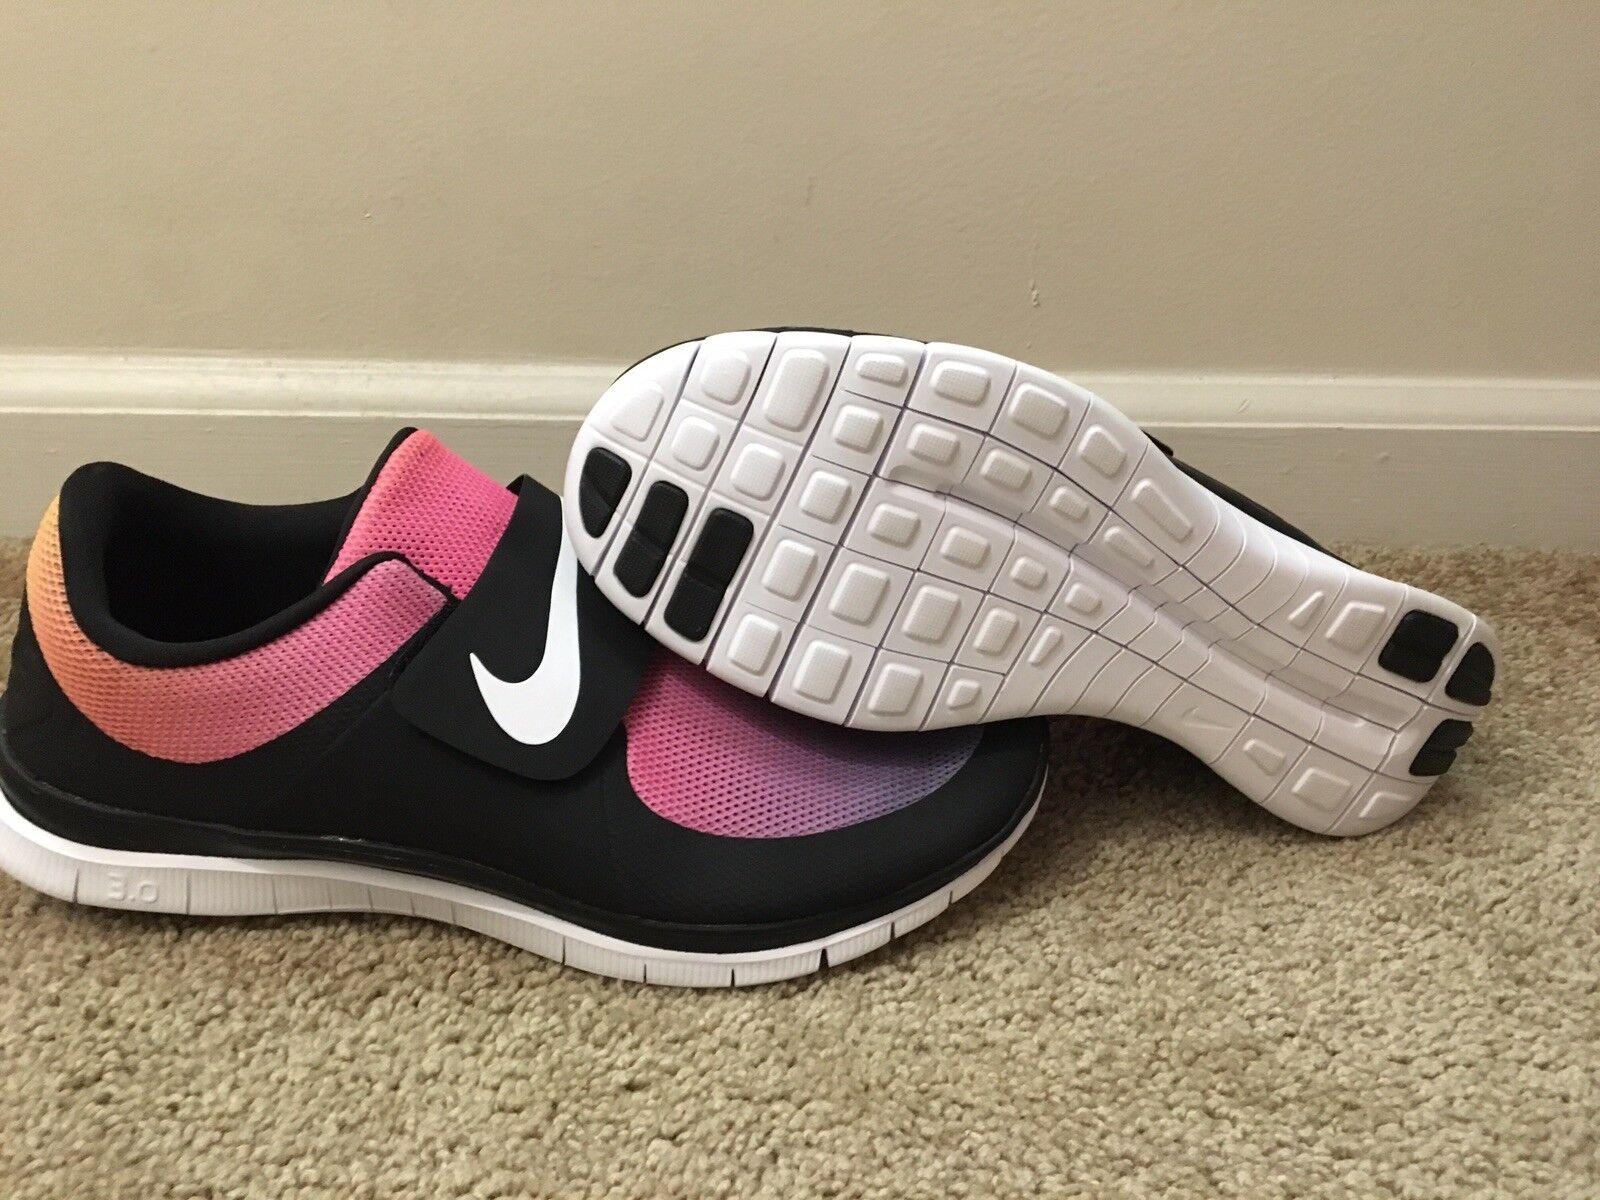 Nike Sneakers   Free Sockfly 724766-005 Size 11   Nike Sneakers For Men